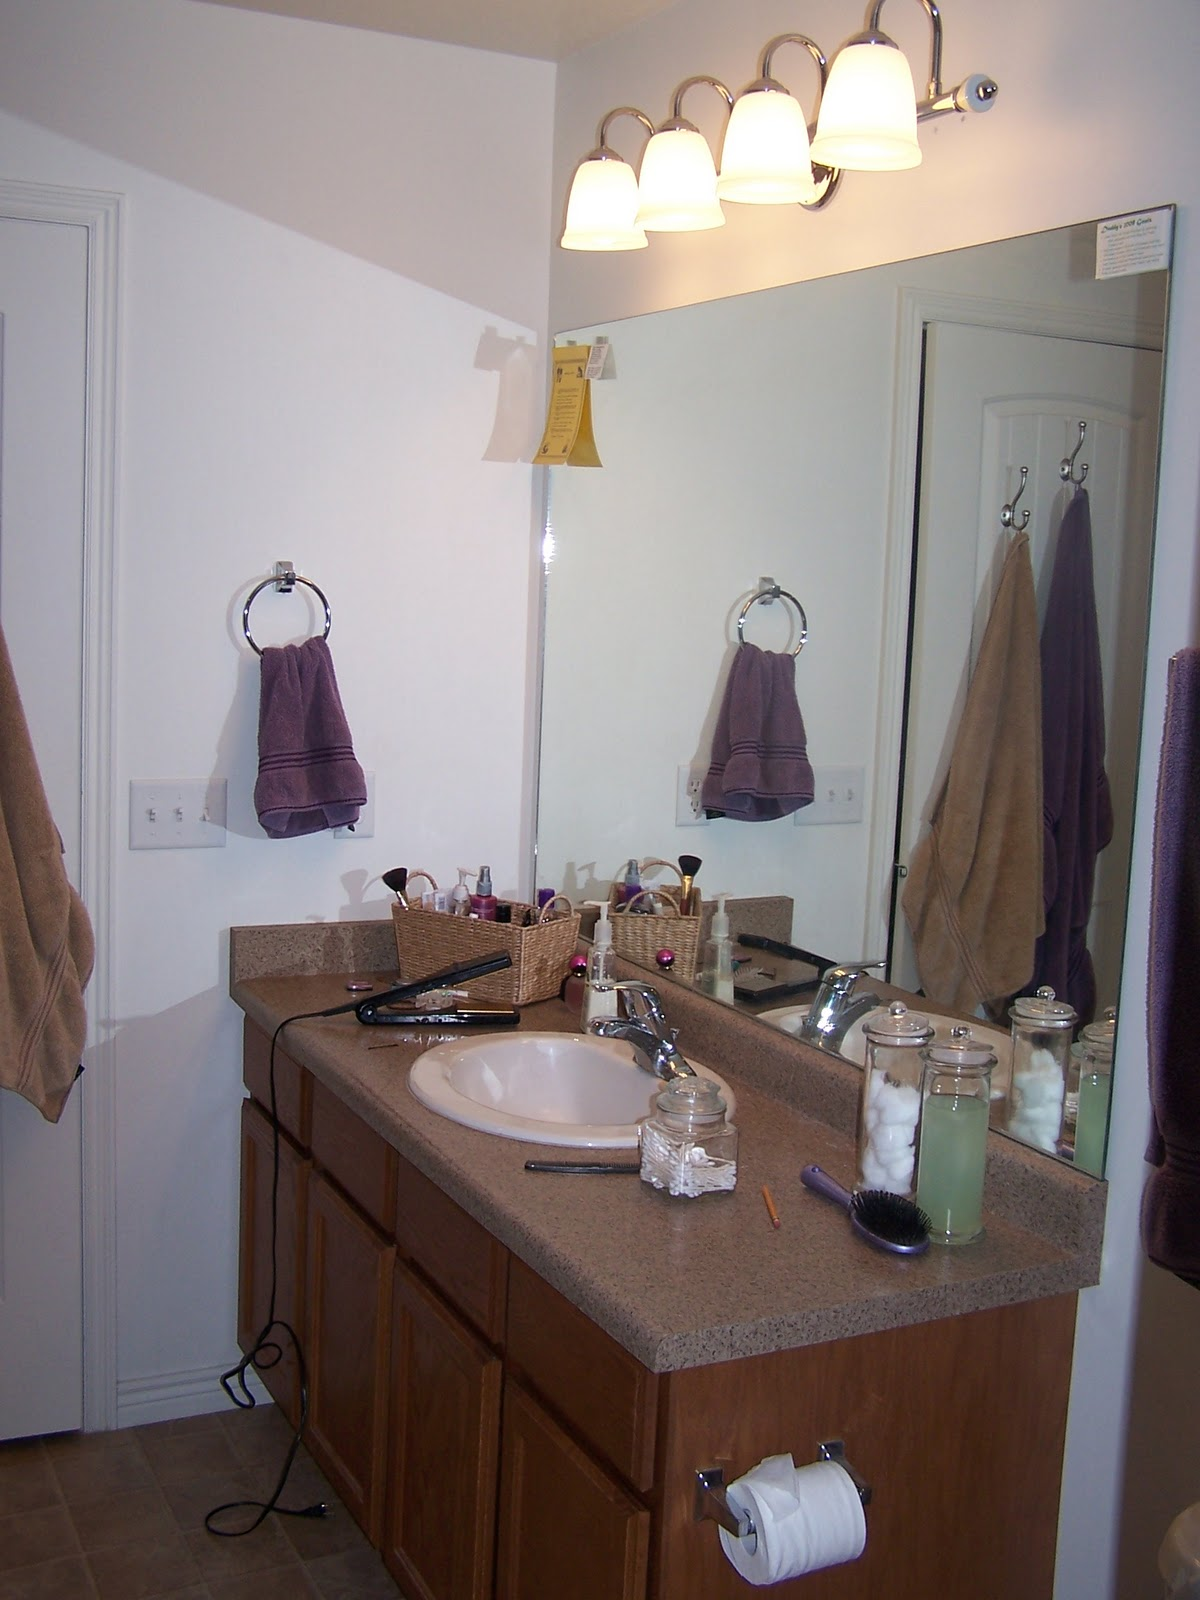 Remodelaholic | Complete DIY Master Bathroom Remodel!!!